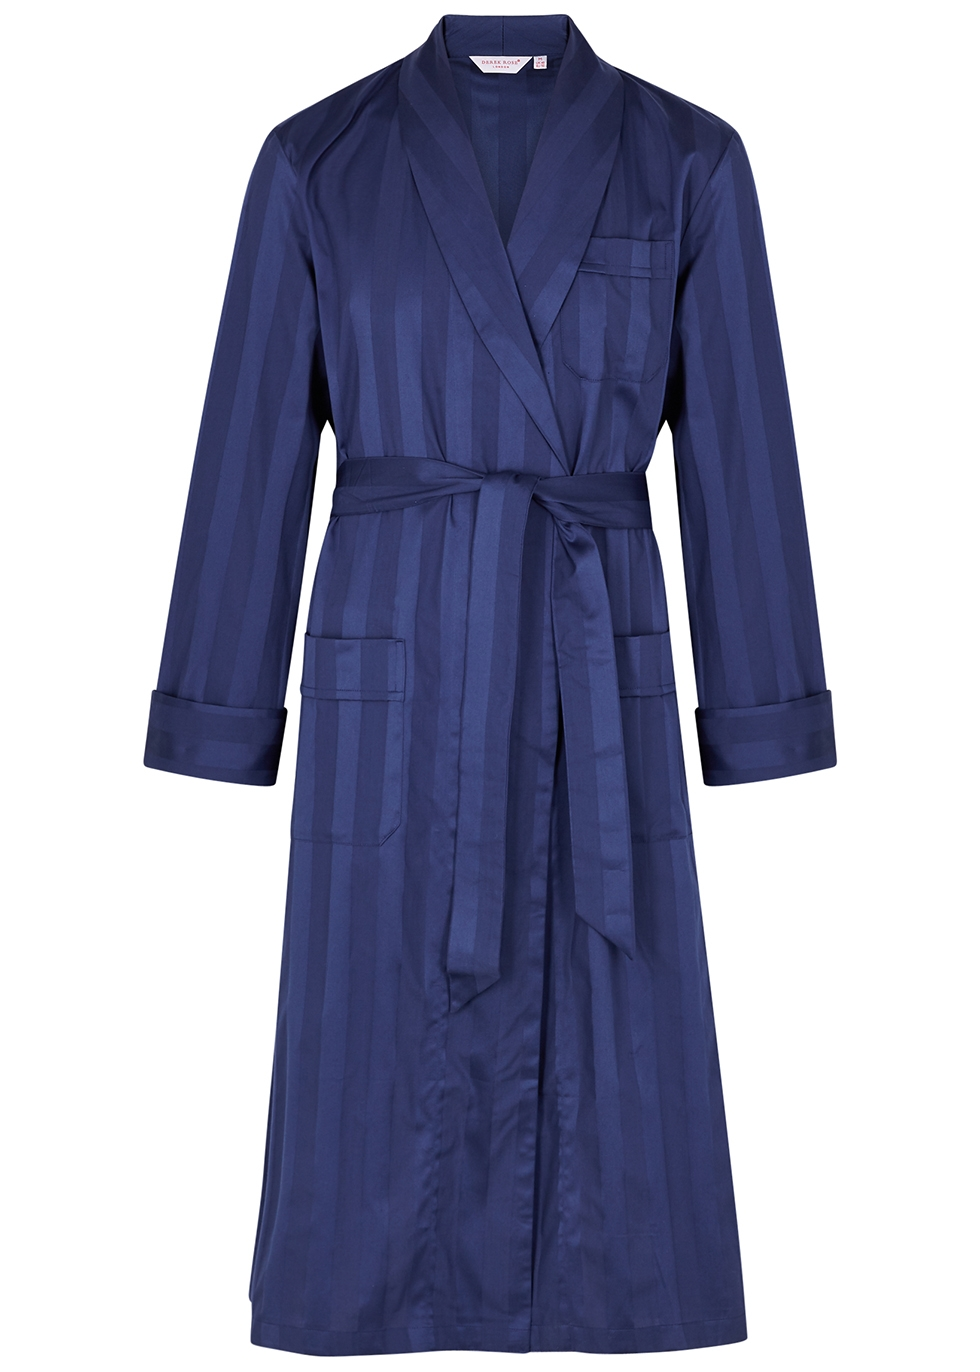 Lingfield navy striped cotton robe